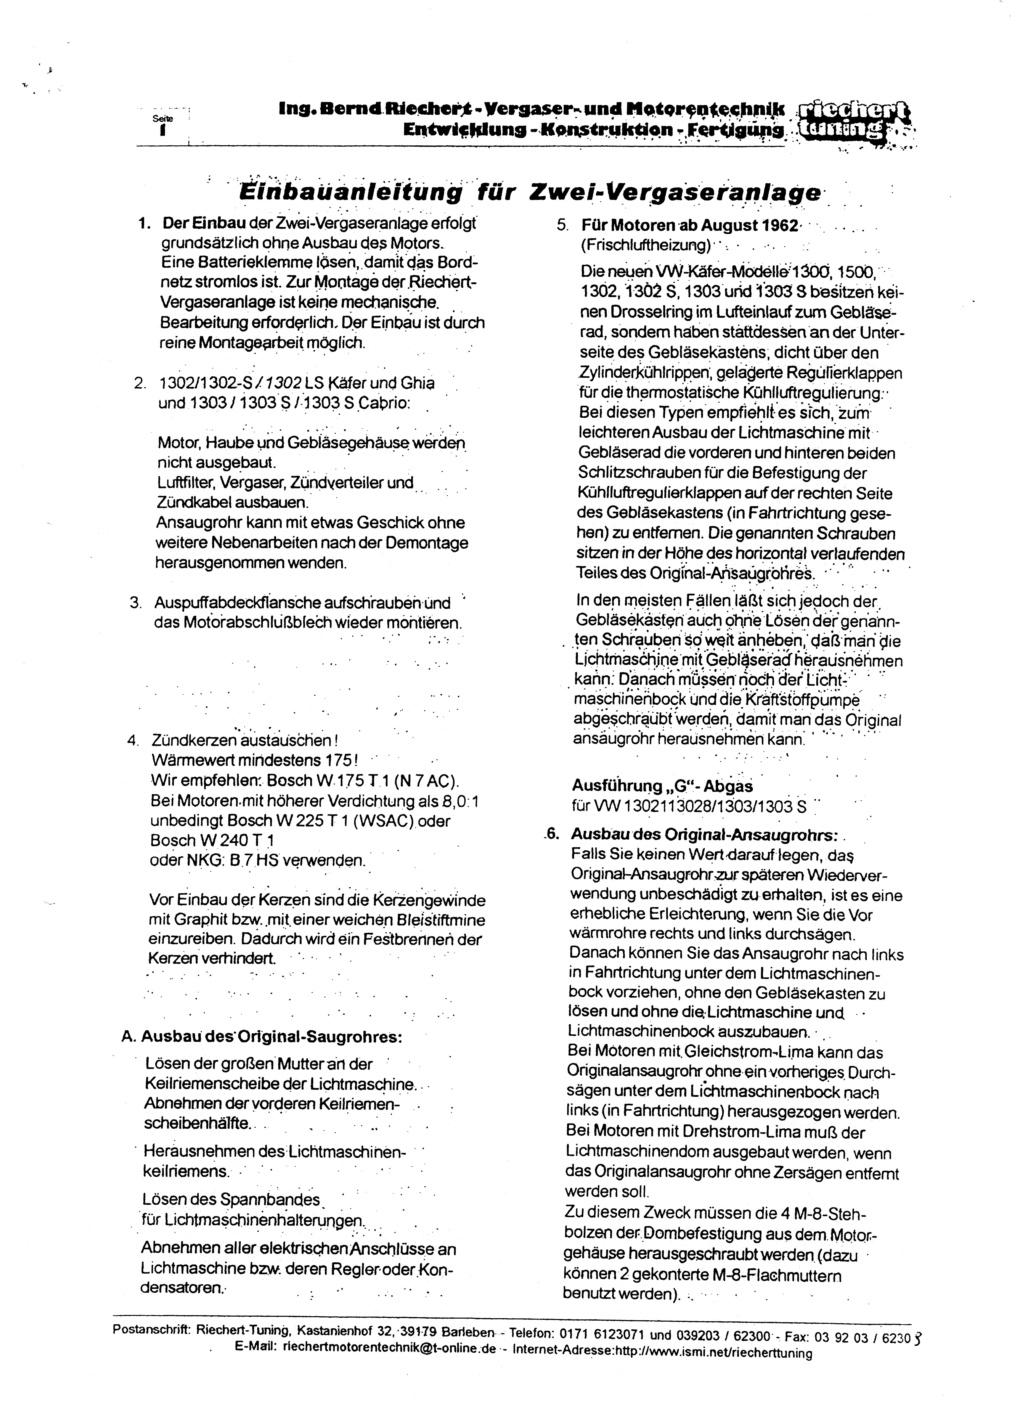 Documentation kit Riechert 1st_pa10